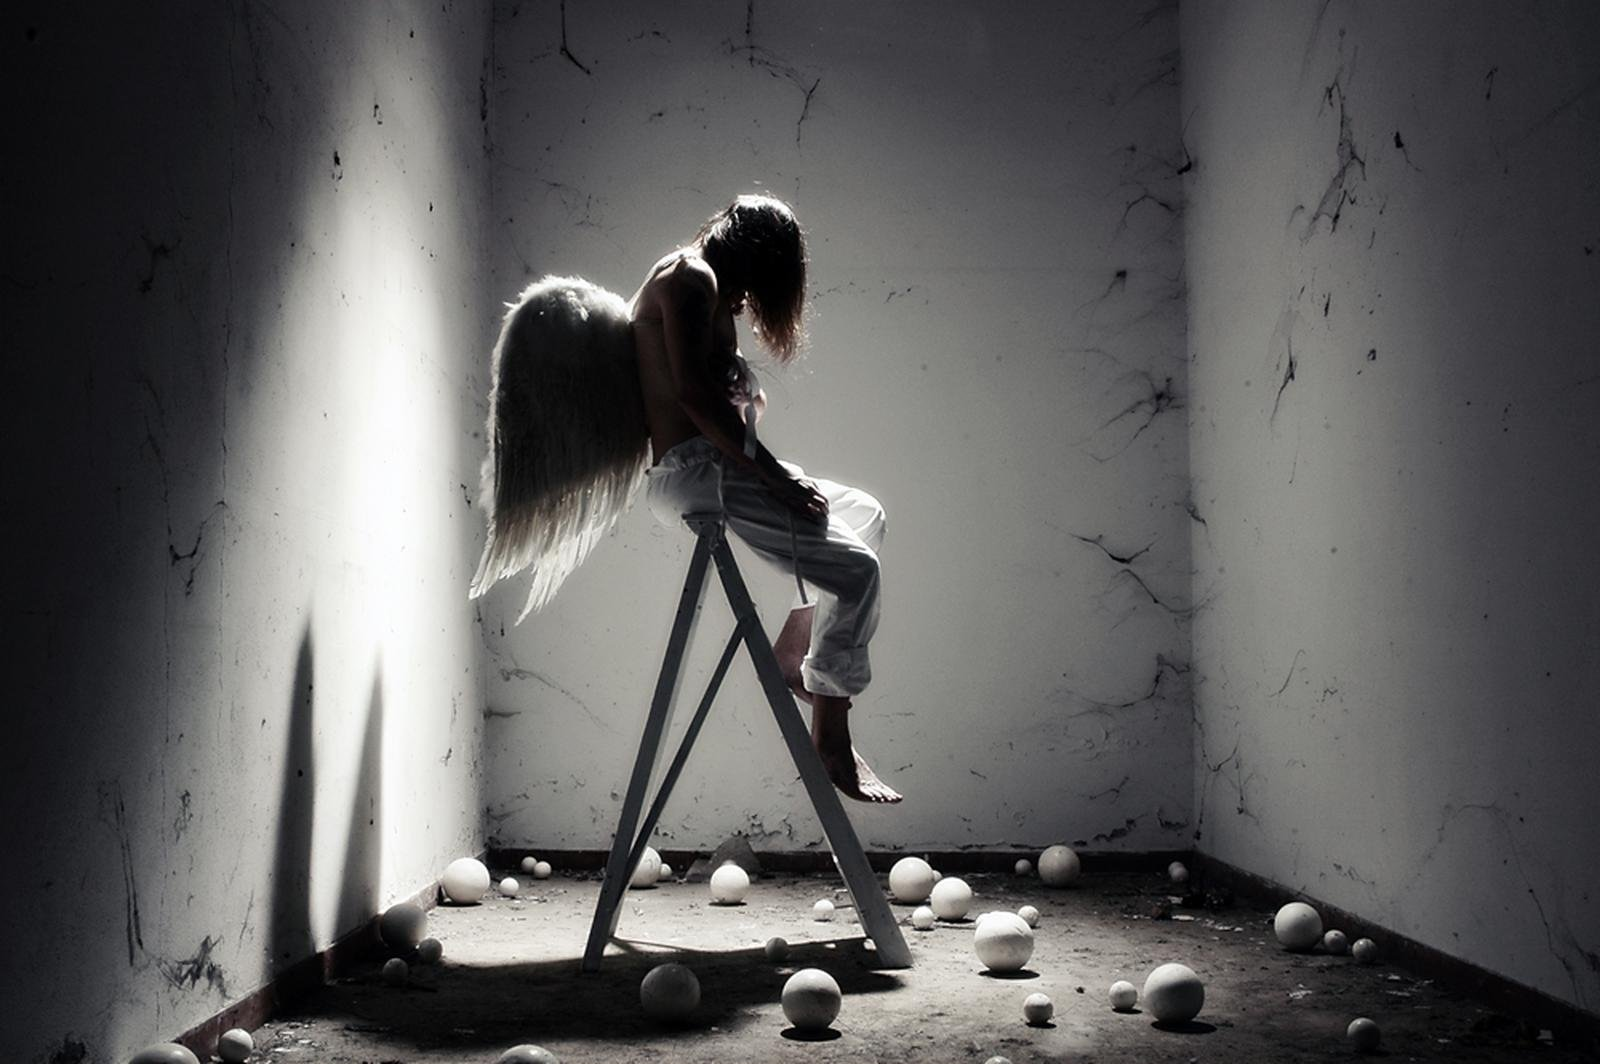 bigorguaWallpaper title Fallen angel 1600x1064